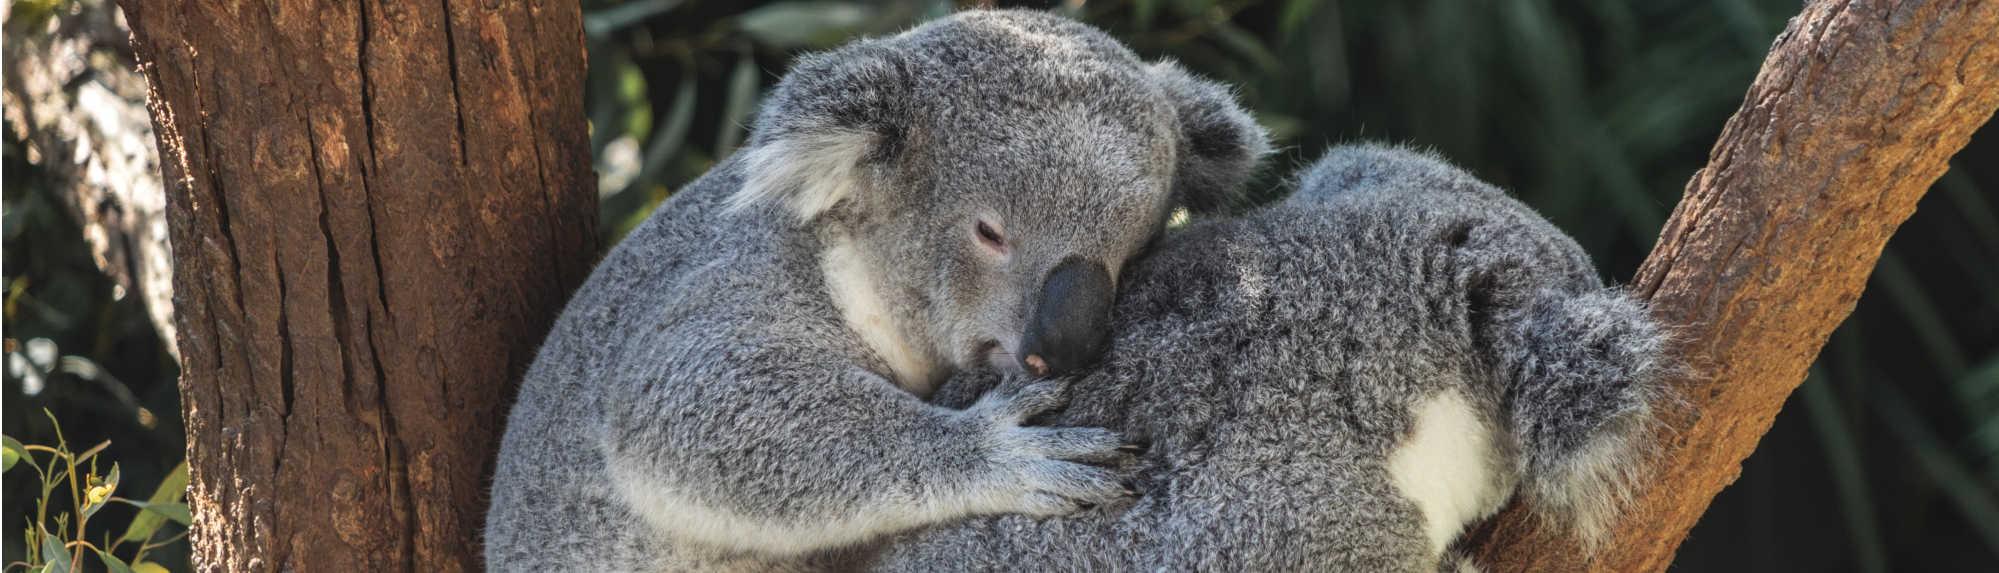 Can You Hold Koalas in Australia?